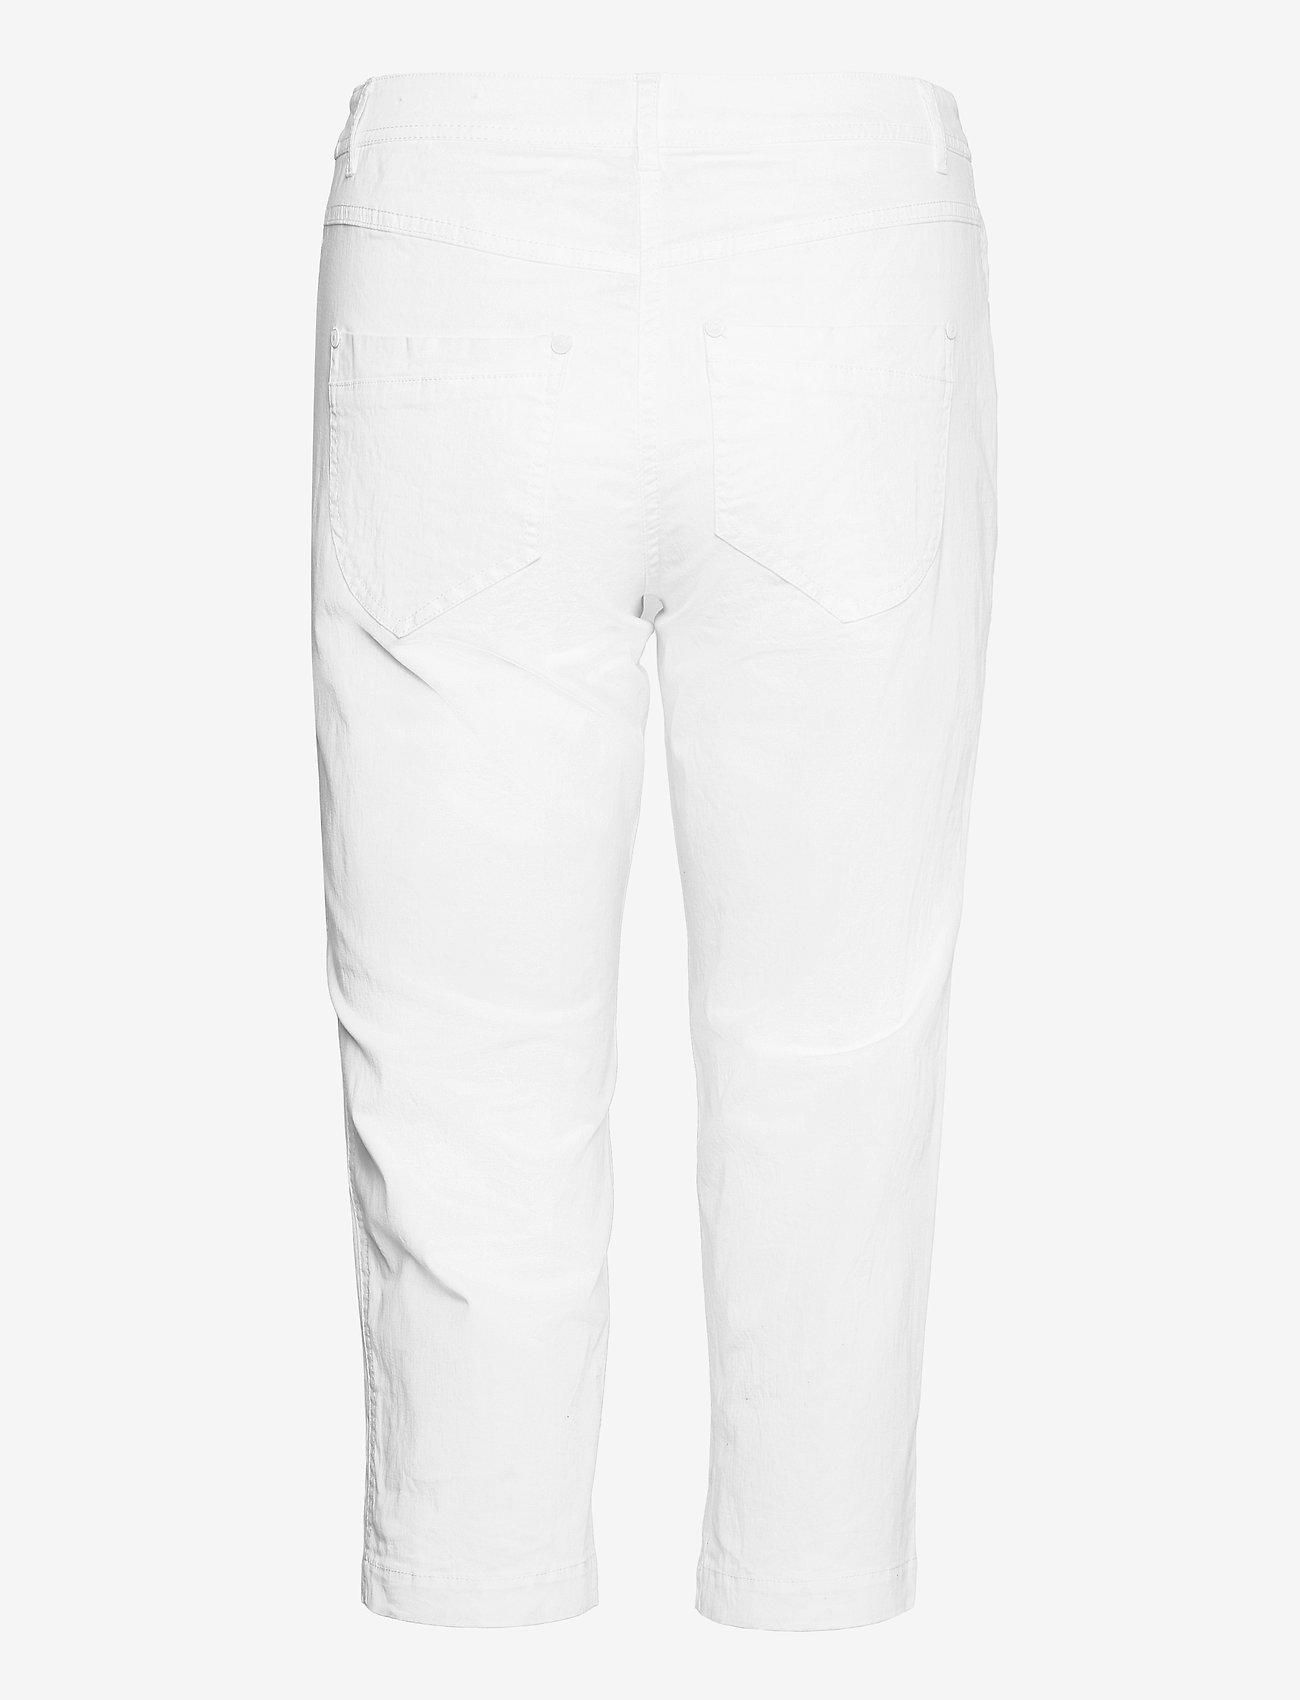 Brandtex - Capri pants - capri bukser - white - 1